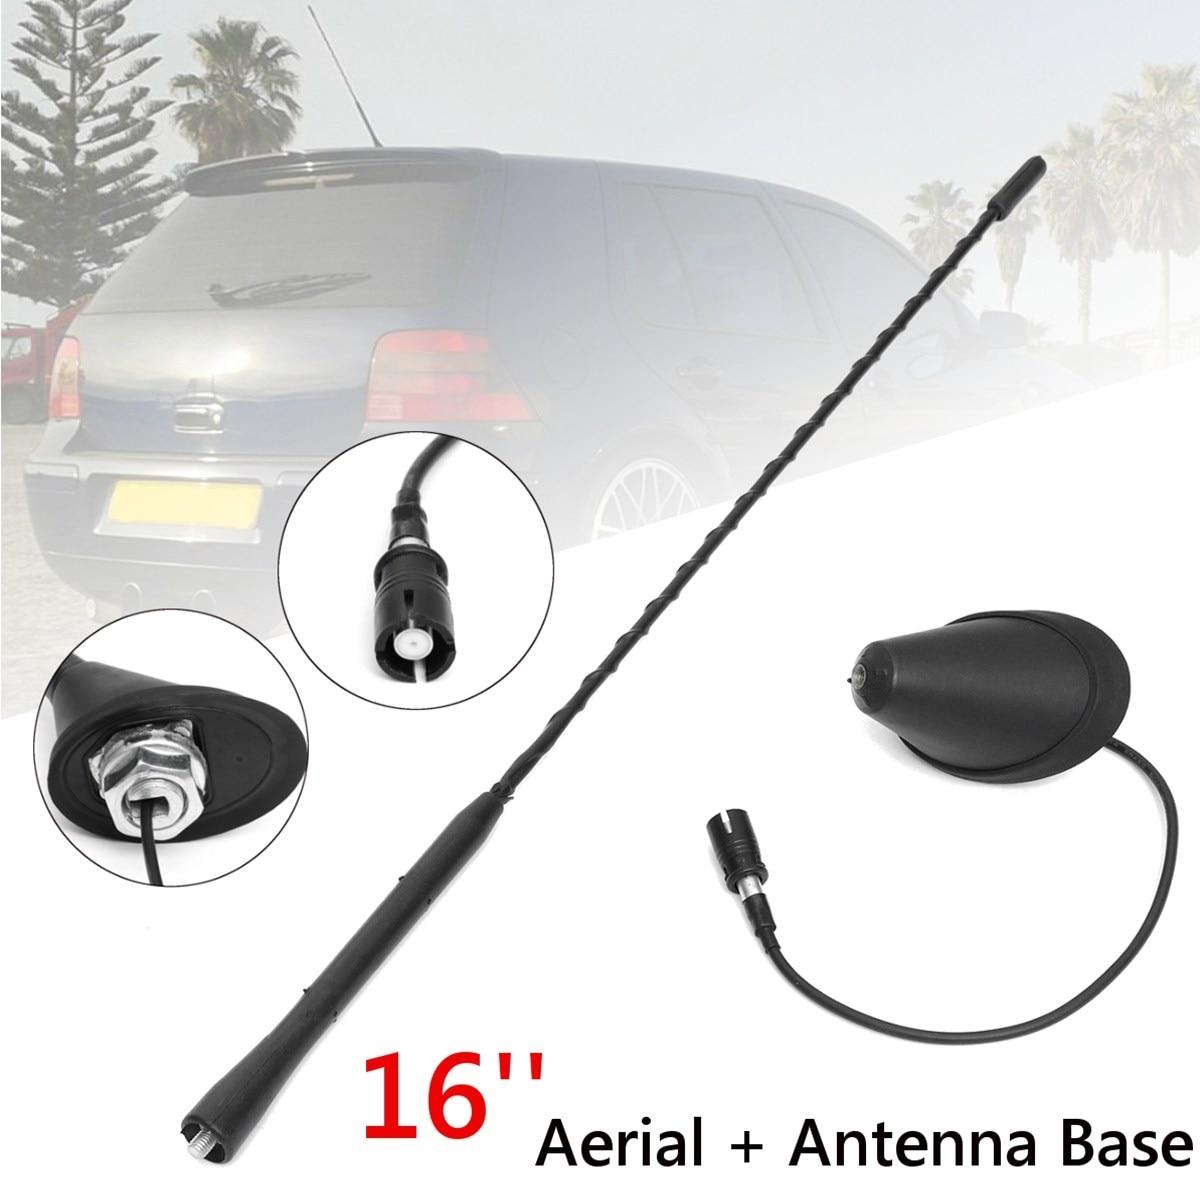 16 pouce Universel AM/FM Antenne Antenne Toit Mât Base Pour VW/Volkswagen/Skoda/Audi/Golf/Passat/Jetta/Bora MK4 1997 1998 1999